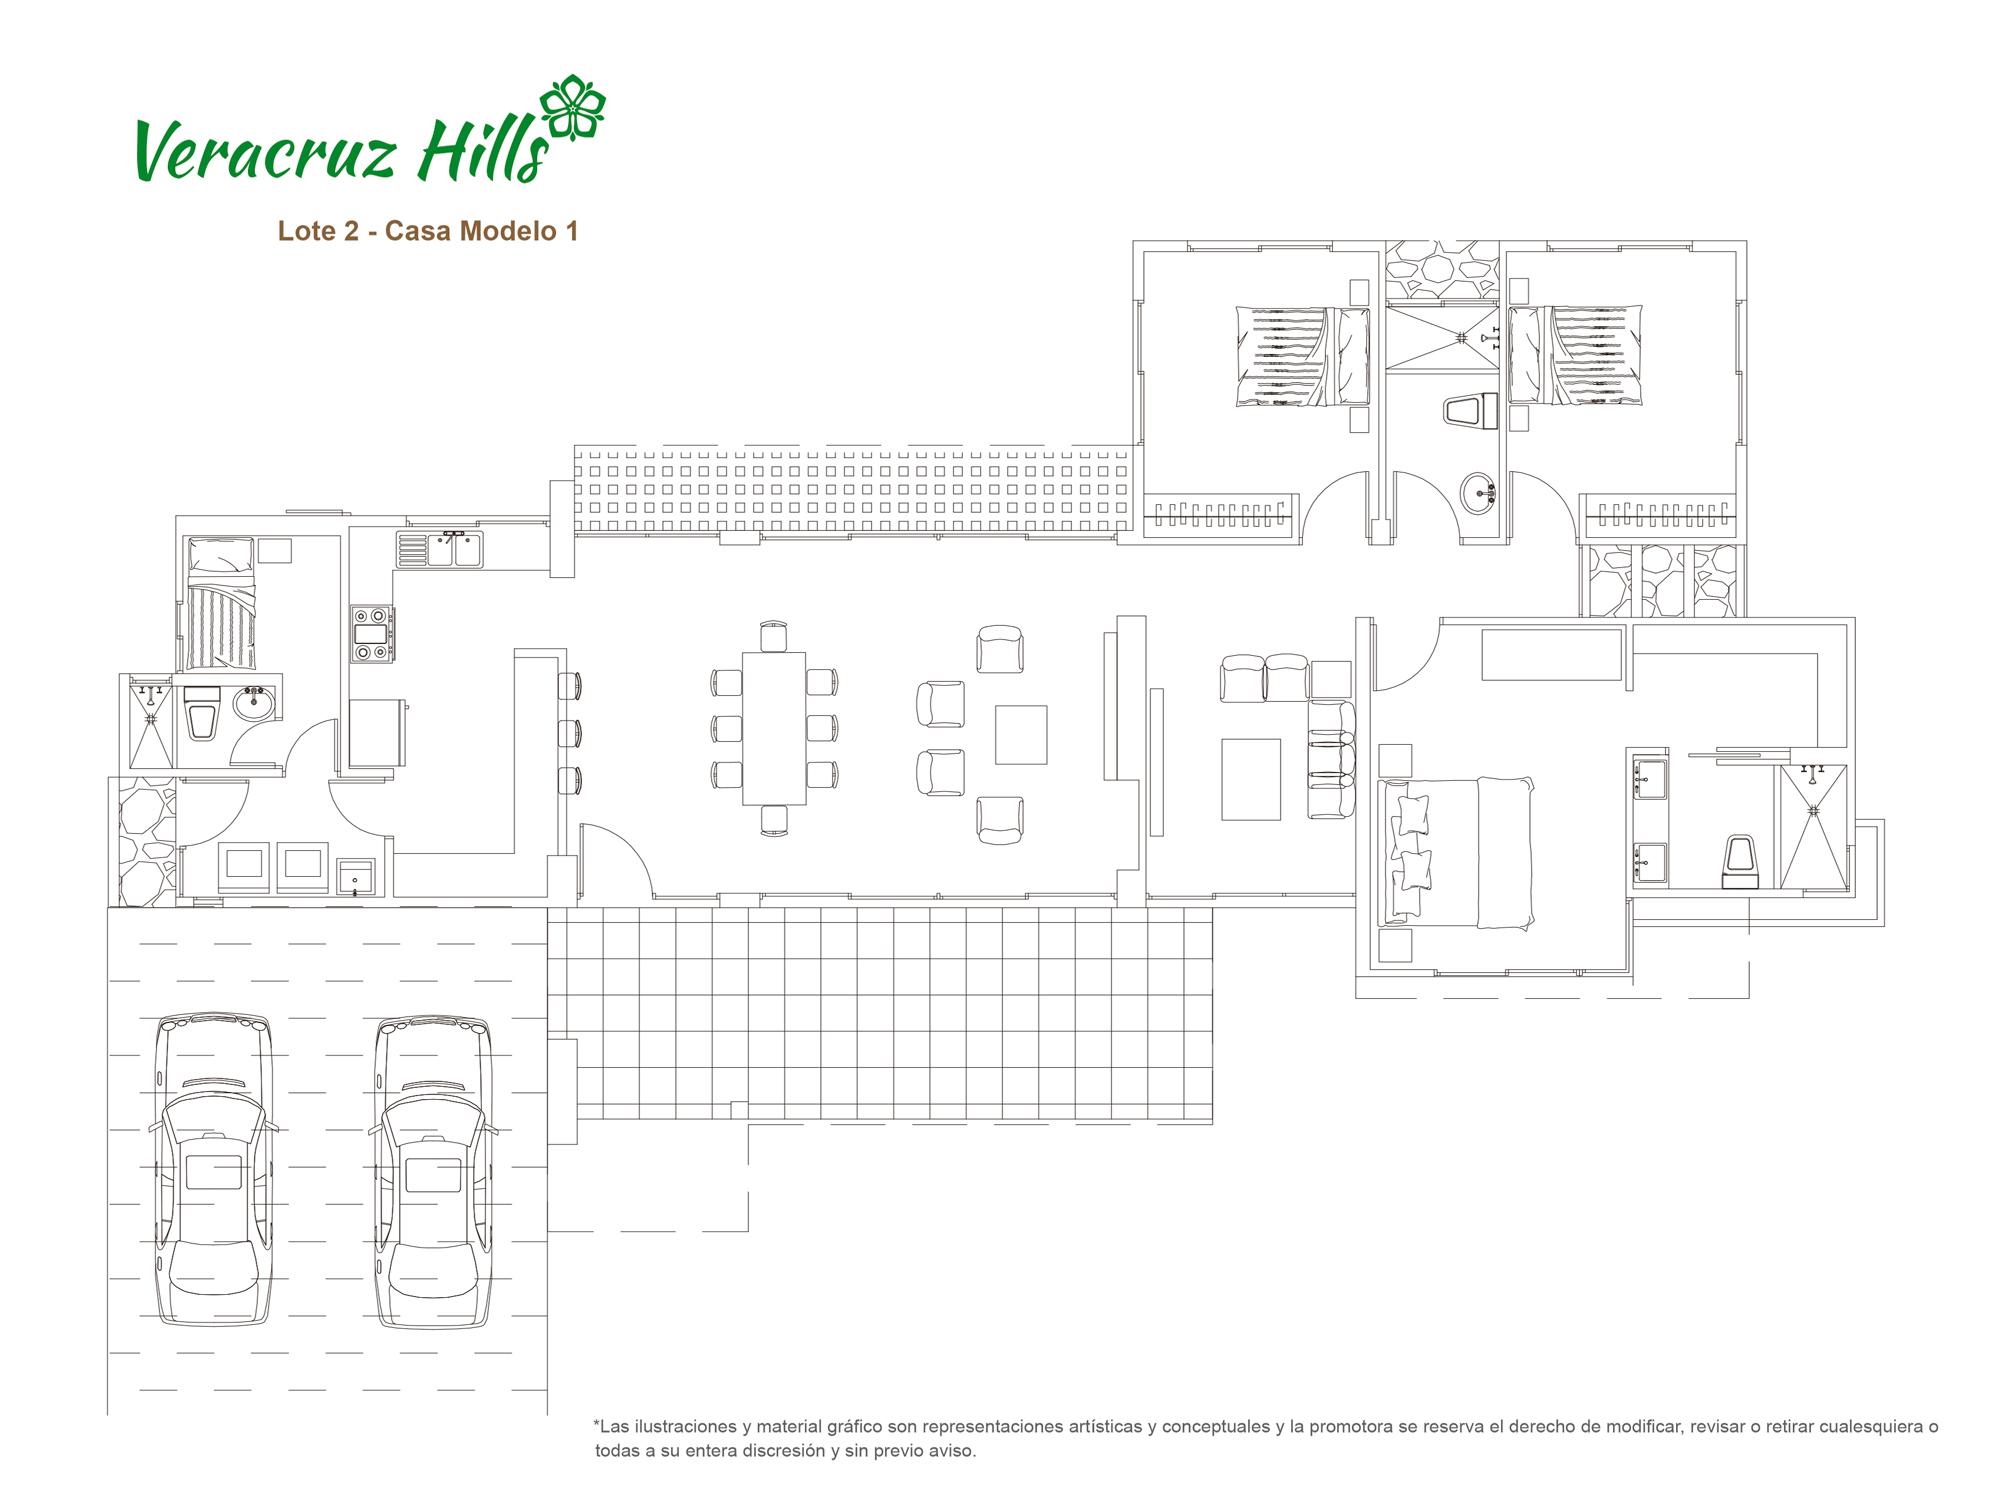 Veracruz Hills -  Modelo 1